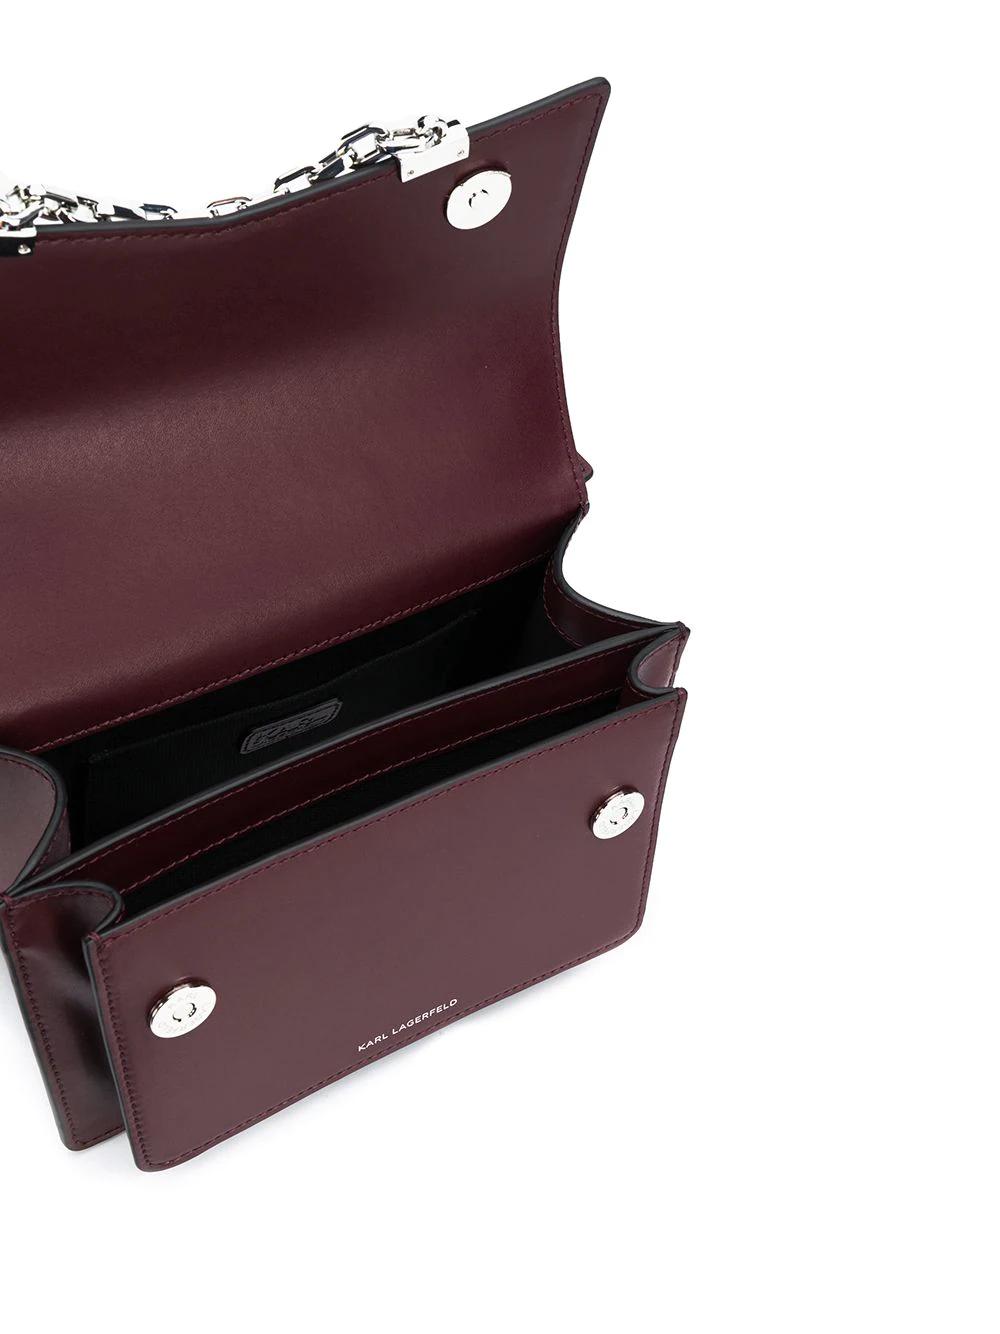 KARL LAGERFELD | Karl Lagerfeld сумка-тоут с цепочками | Clouty